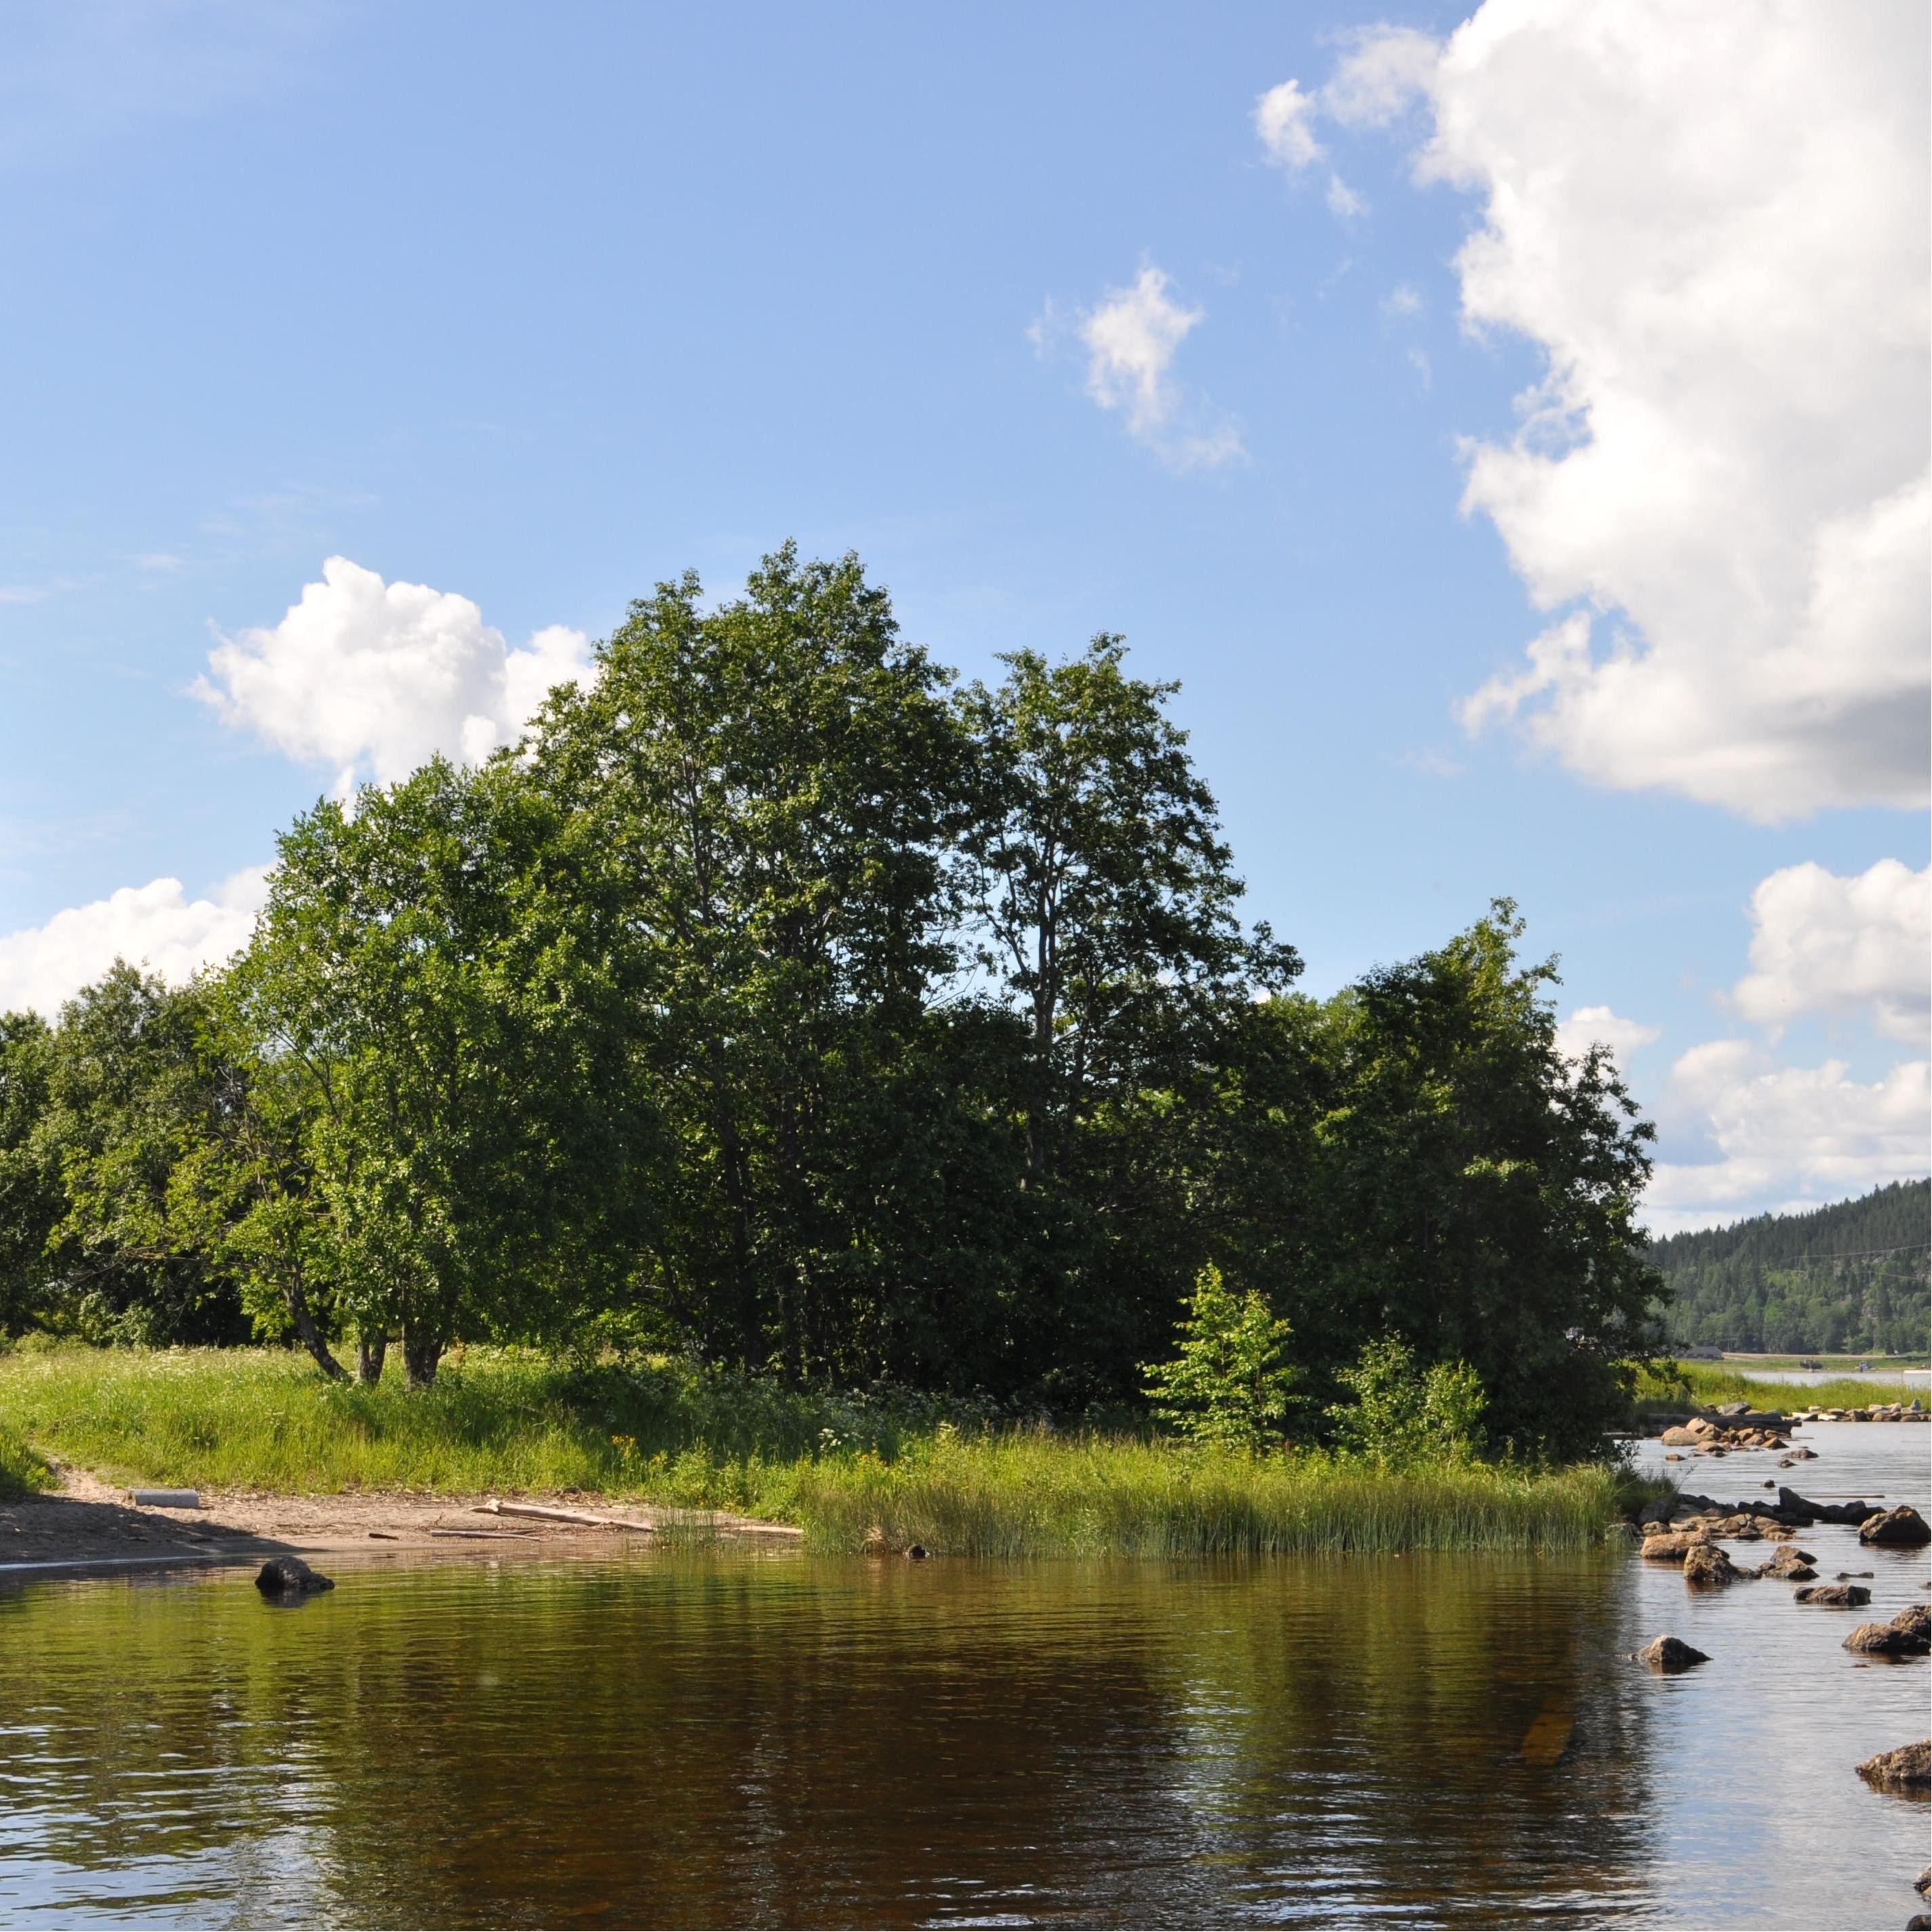 Nature Reserve Klampenborg